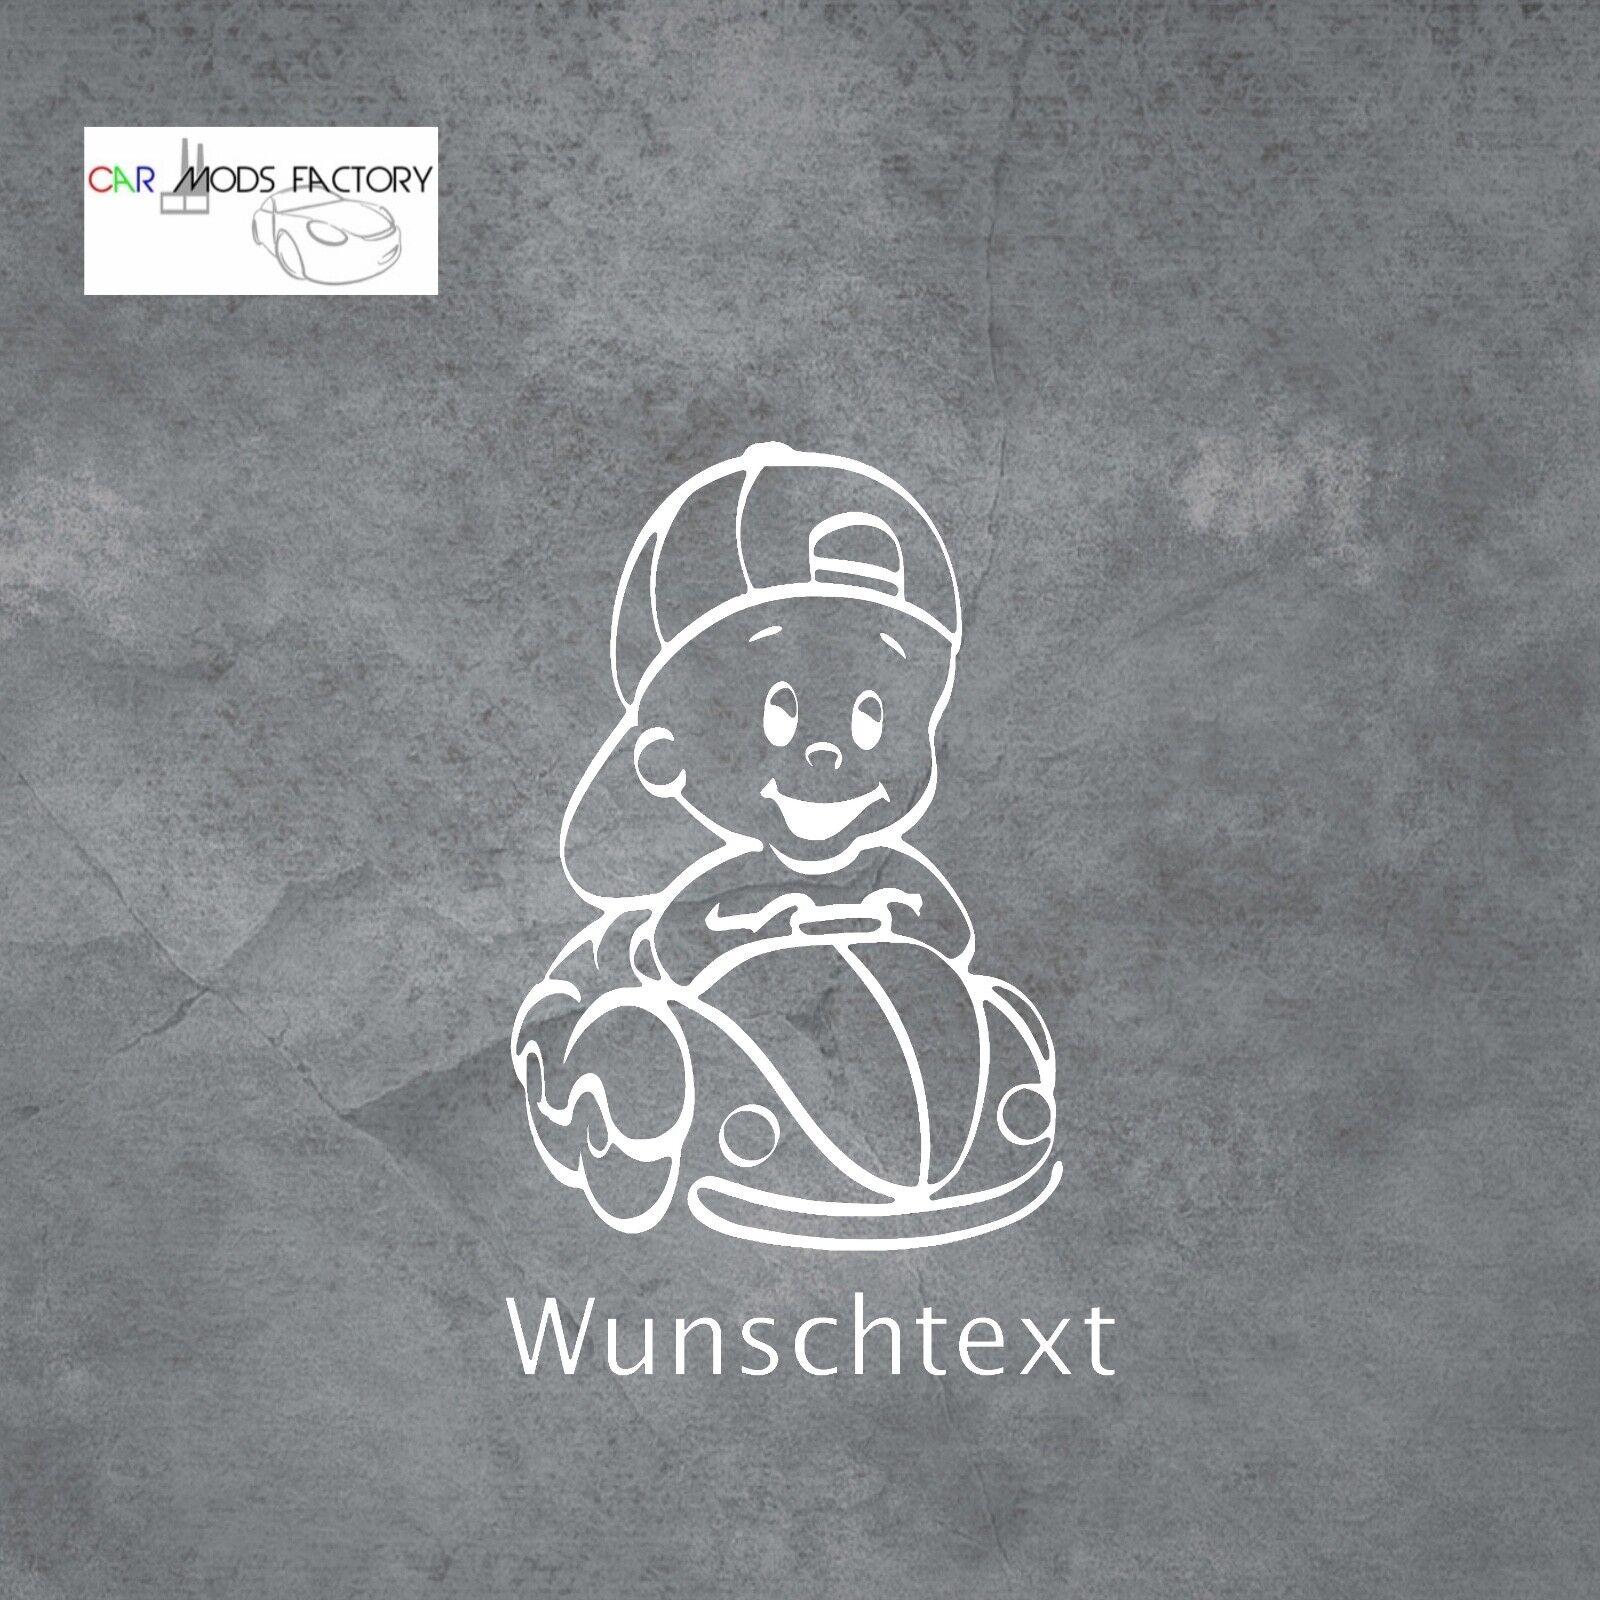 Baby an Bord Aufkleber, Auto Aufkleber - 20x20 cm - Sticker